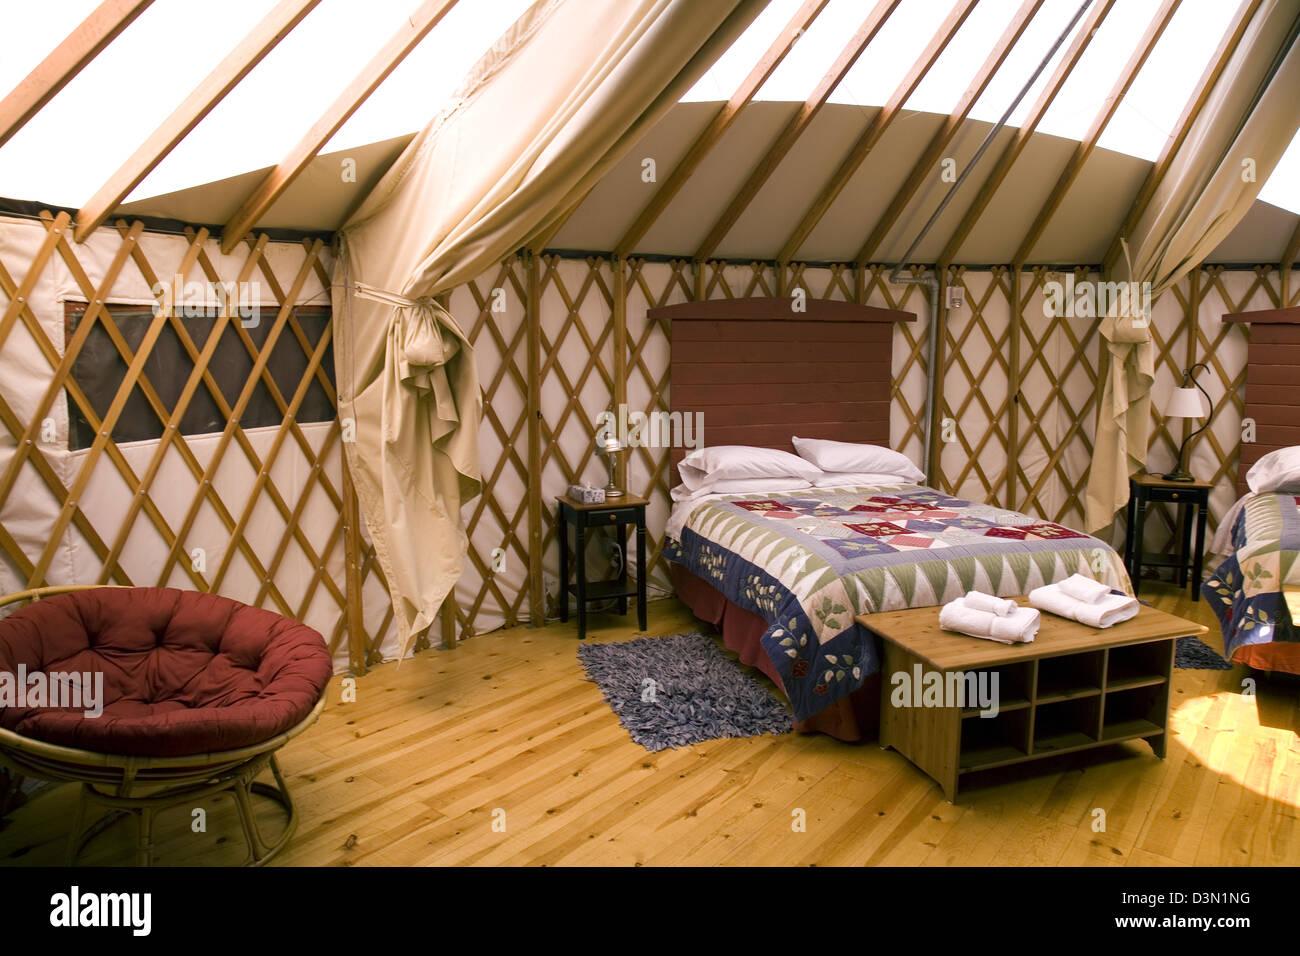 yurt interior at treebones resort, big sur, california, usa stock